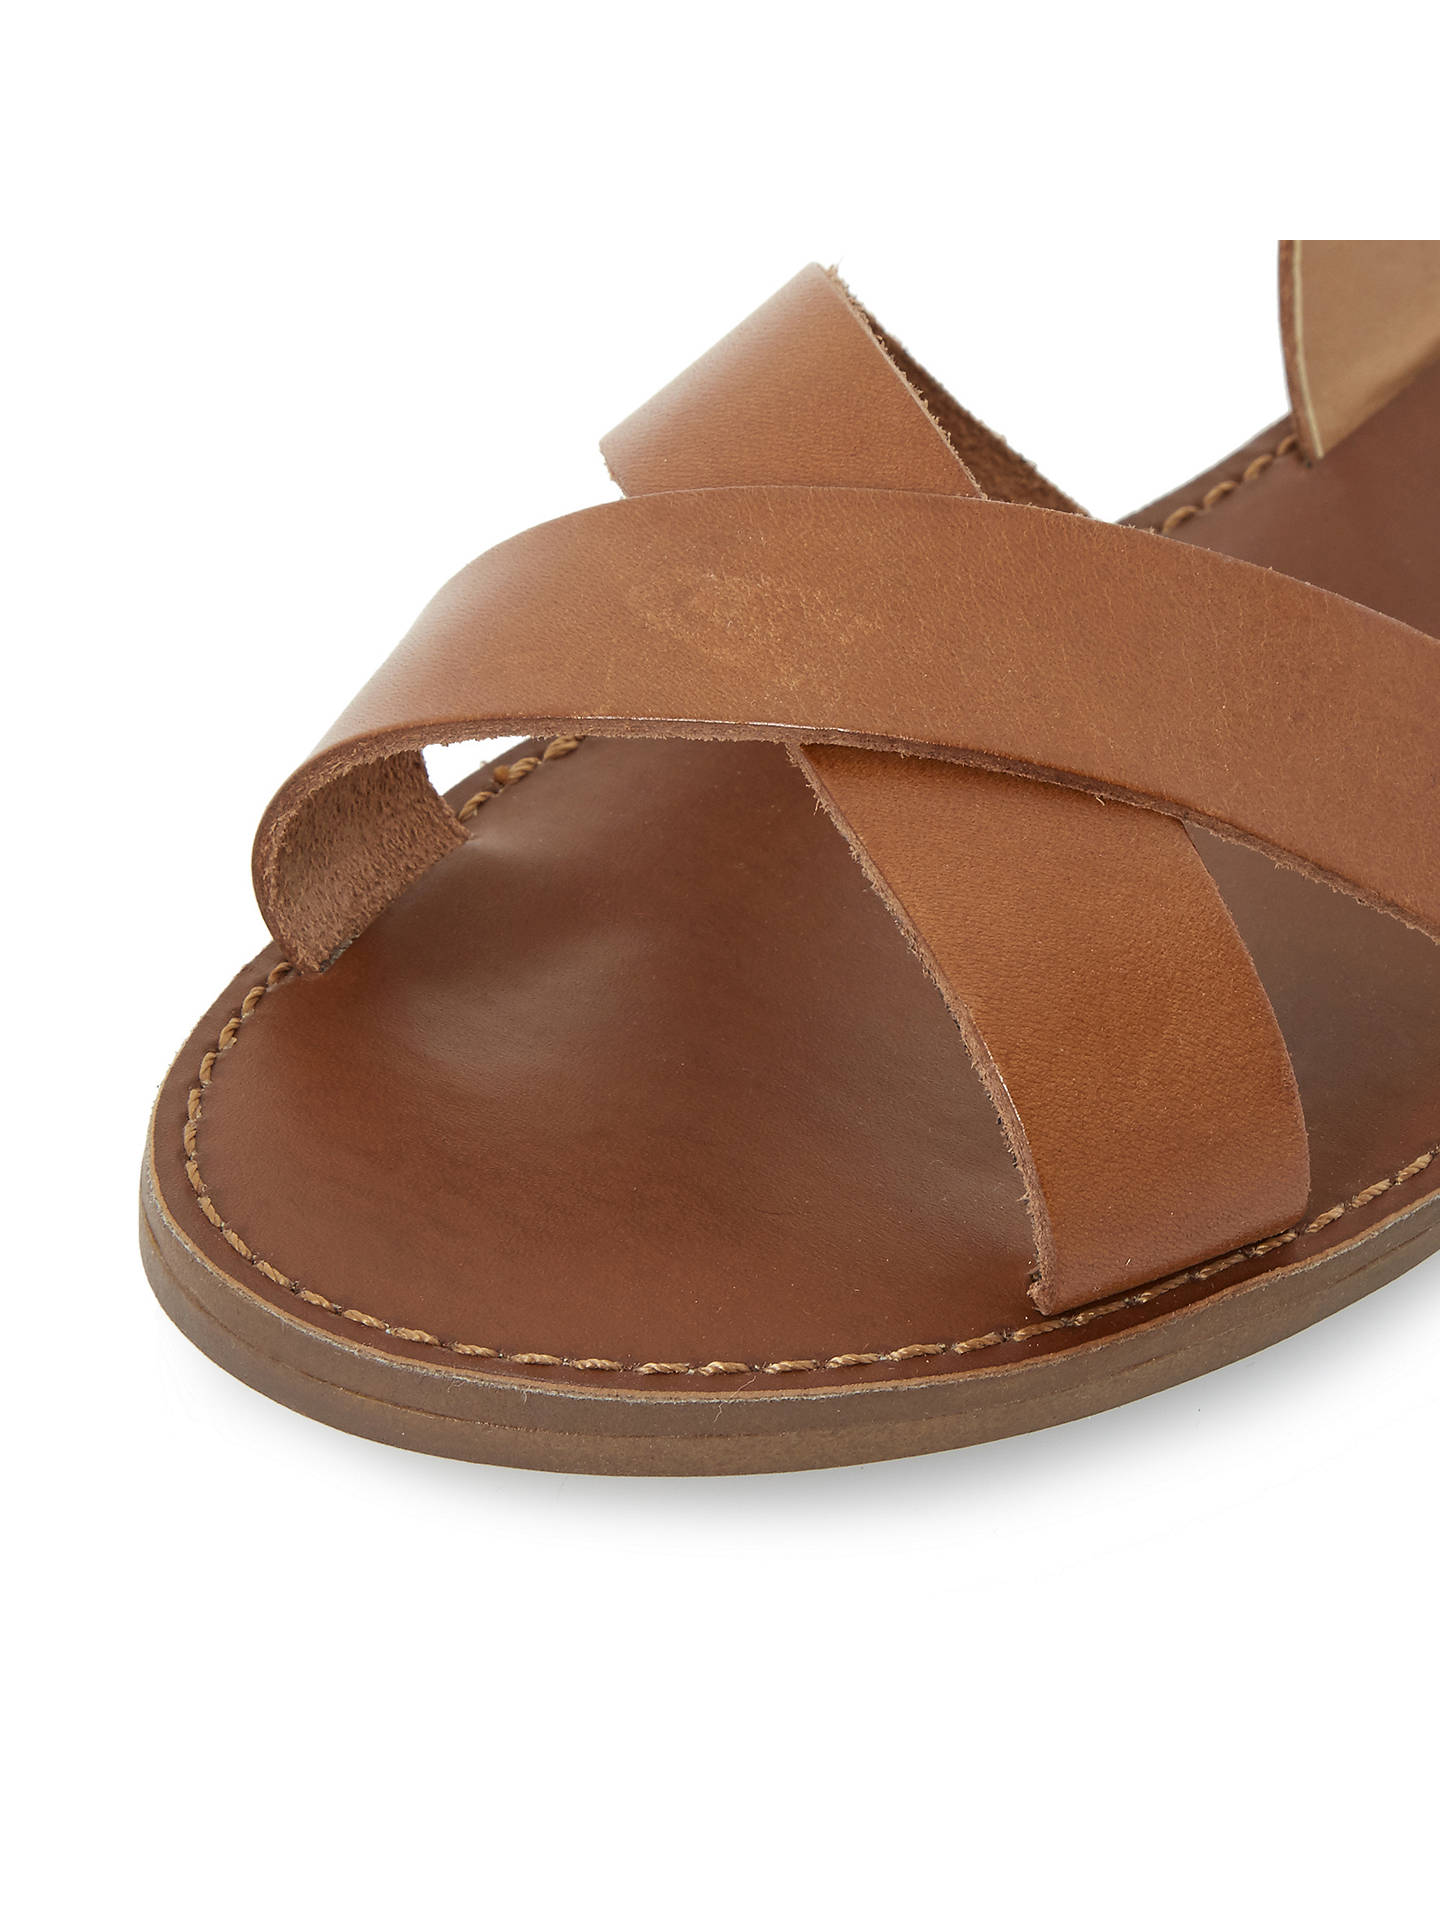 125c13b456f1 ... Buy Dune Laila Cross Vamp Leather Sandals